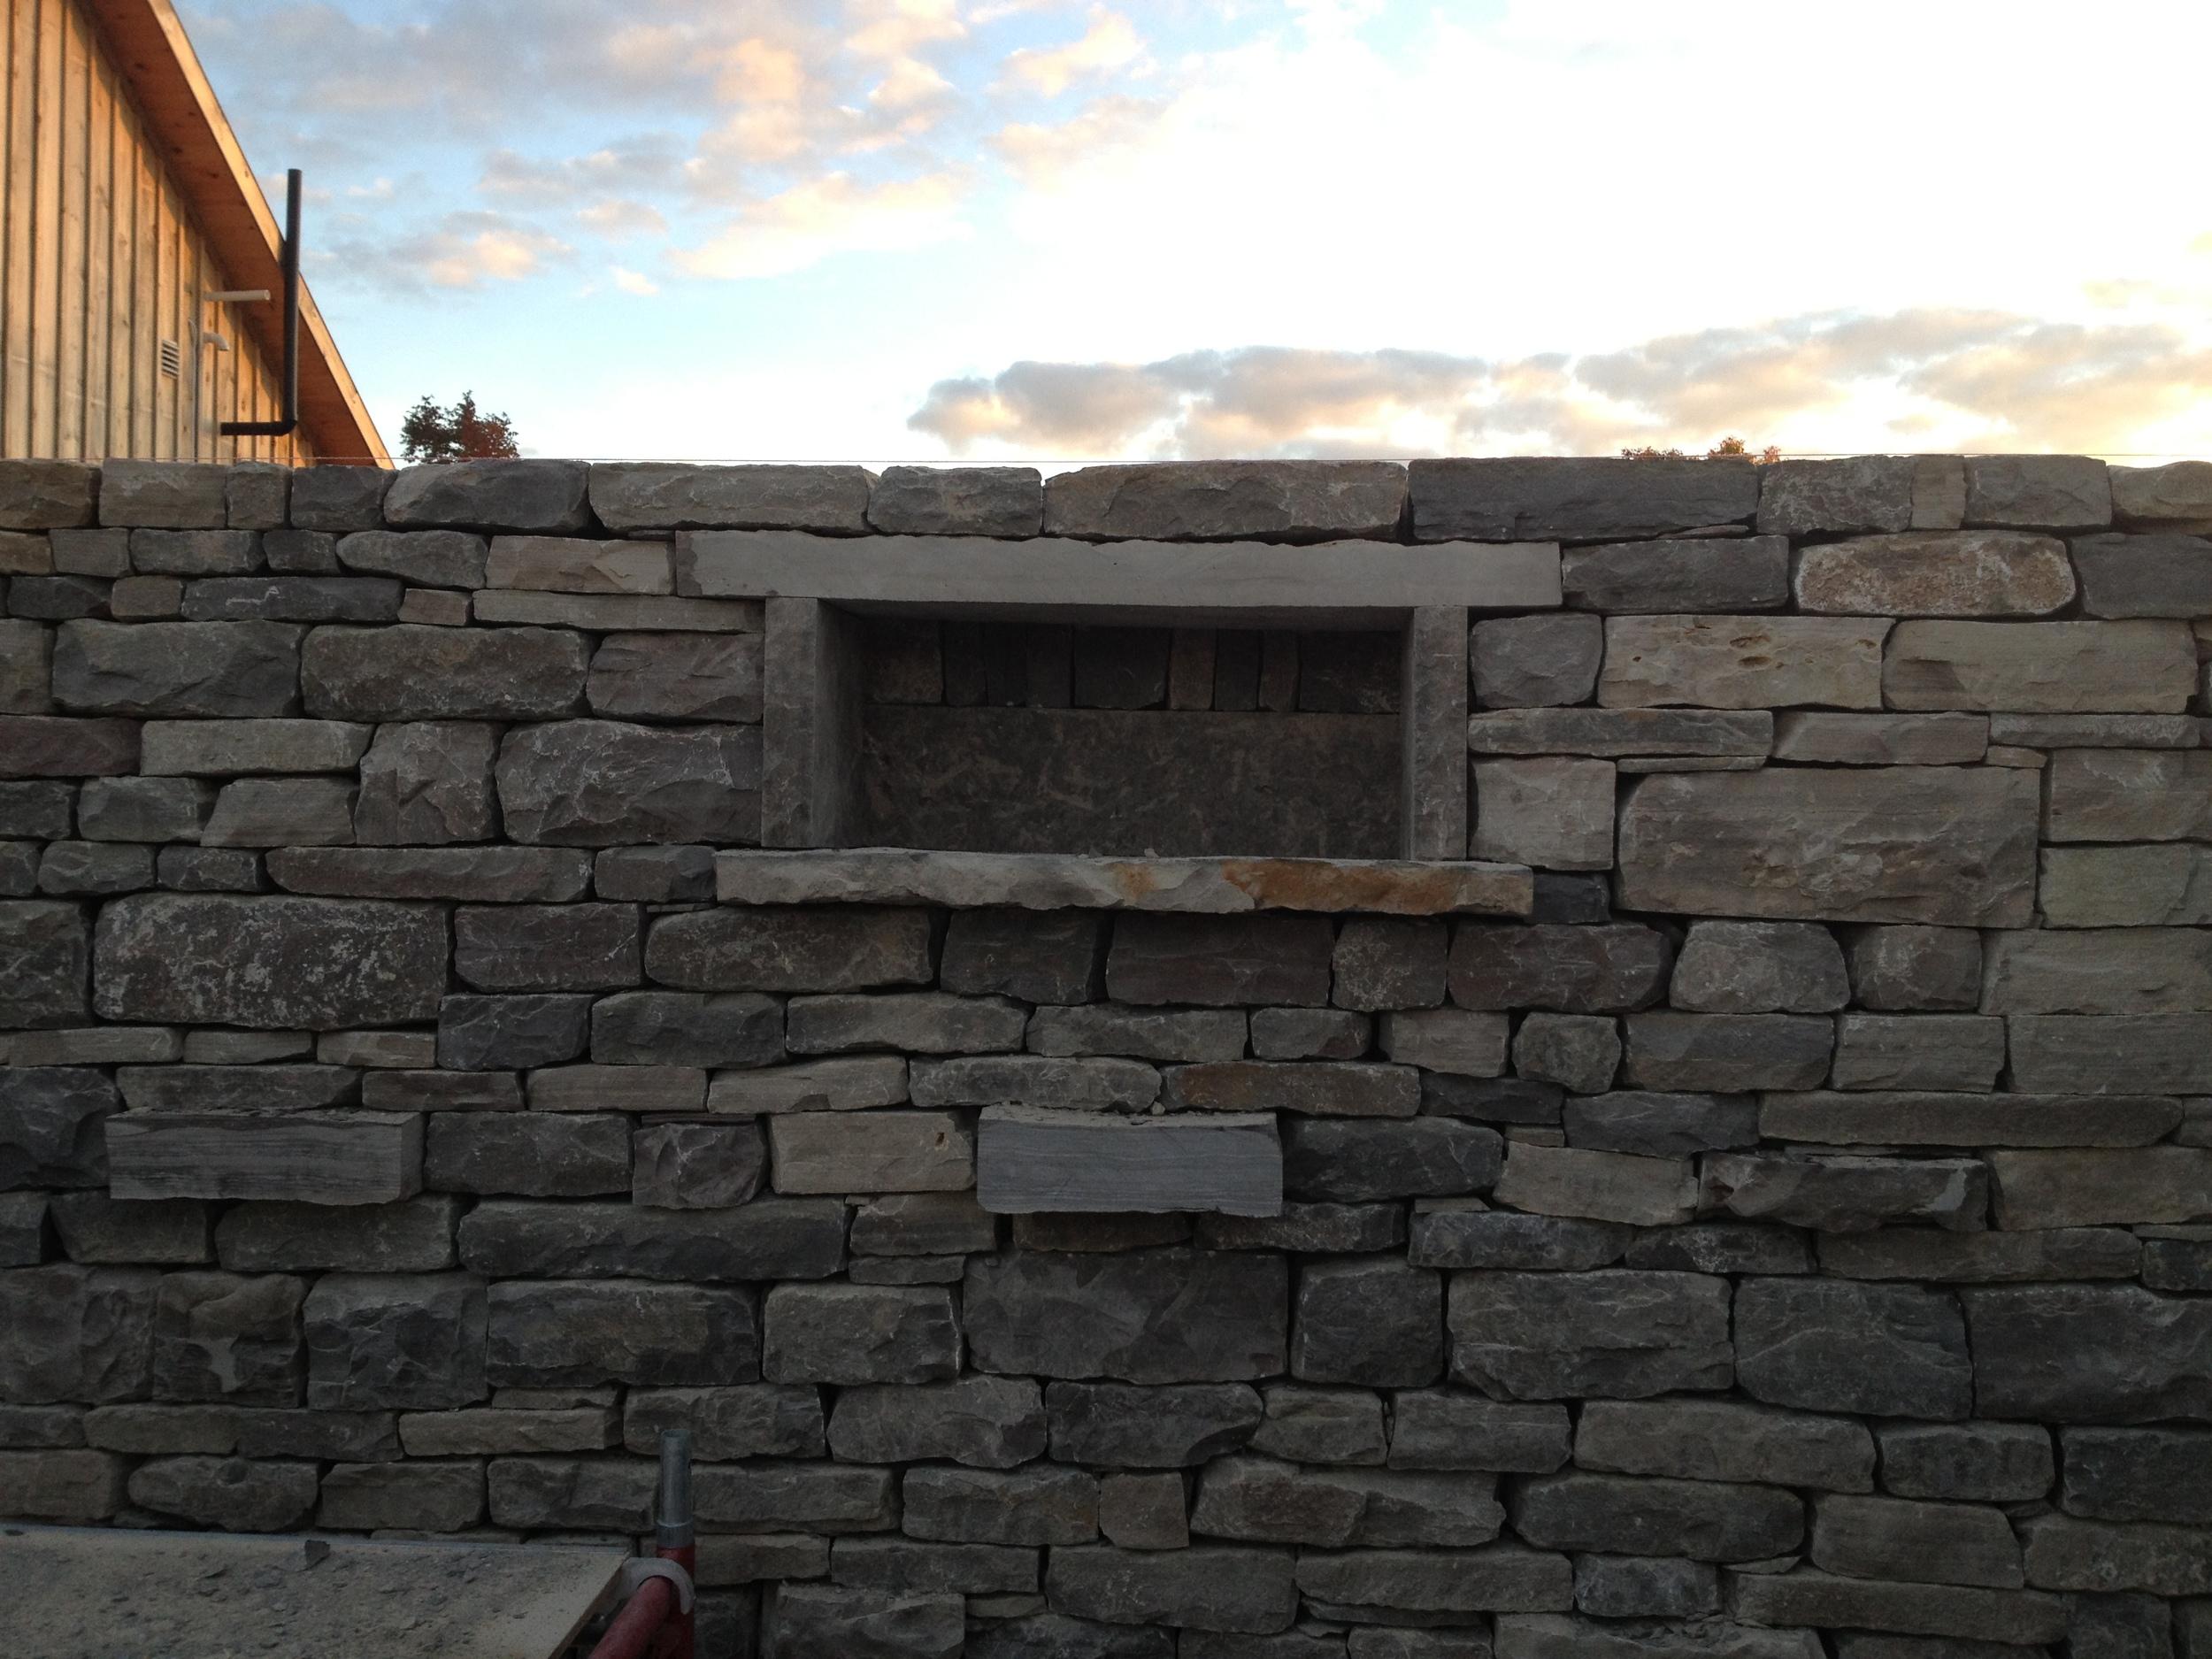 Drystone wall, window and shelving